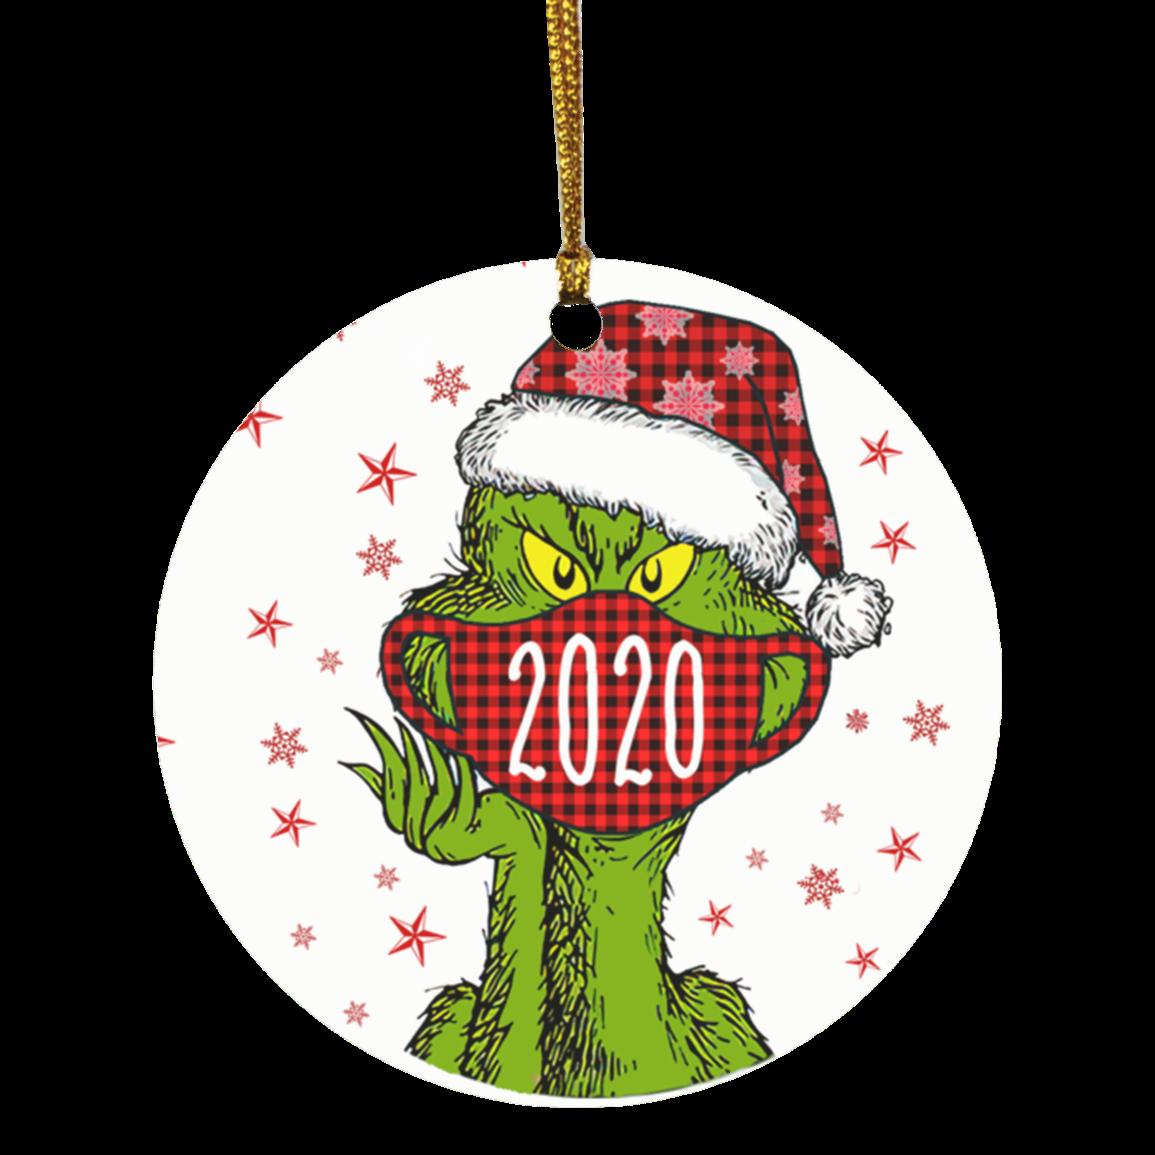 Christmas Grinch Santa face mask 2020 quarantine ornament